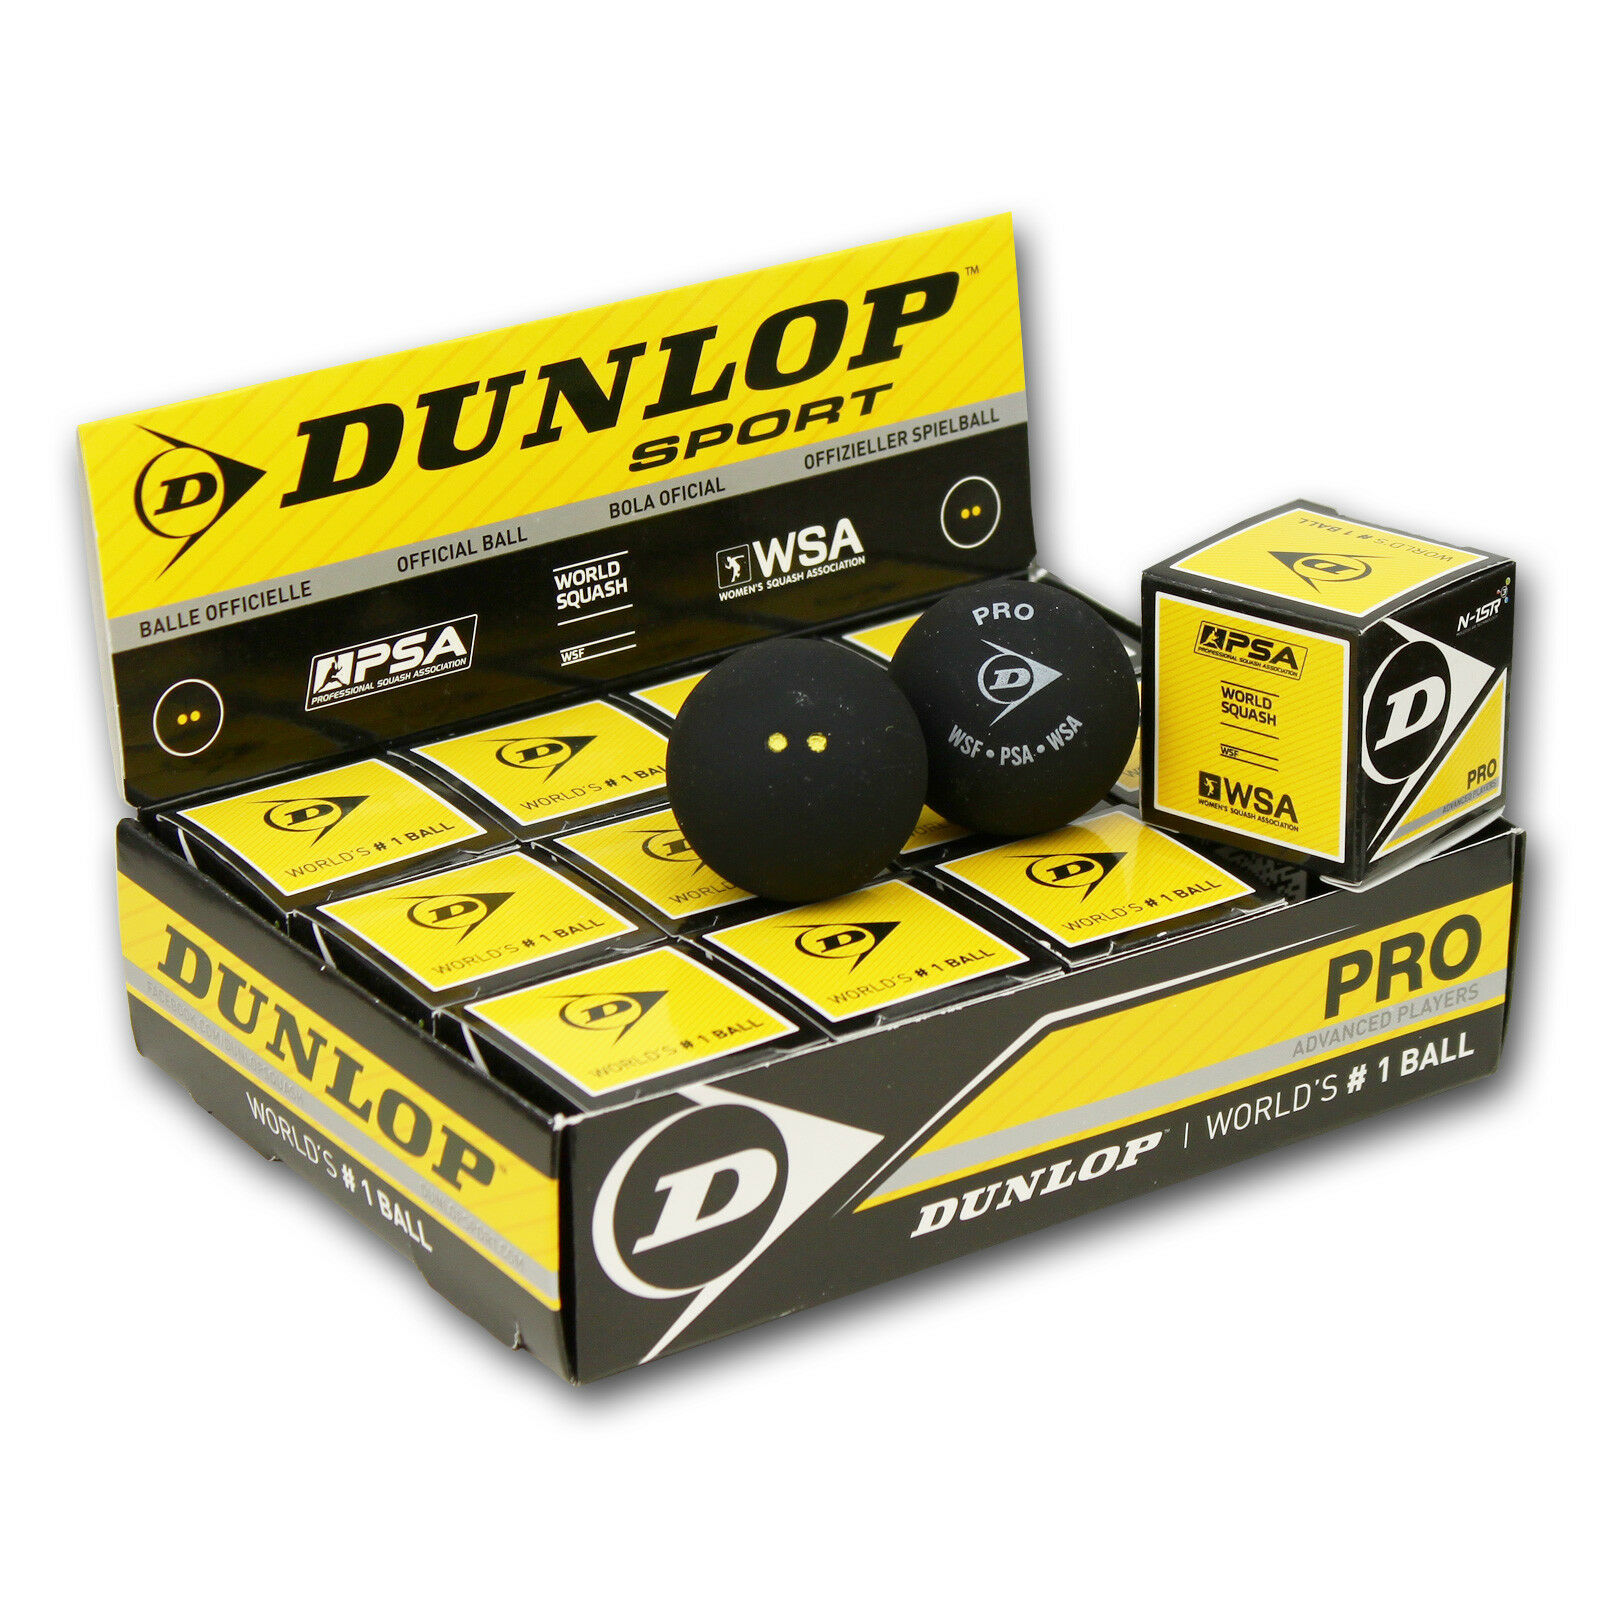 12 Squashbälle DUNLOP PRO - 2 yellowe Punkte Squash Bälle